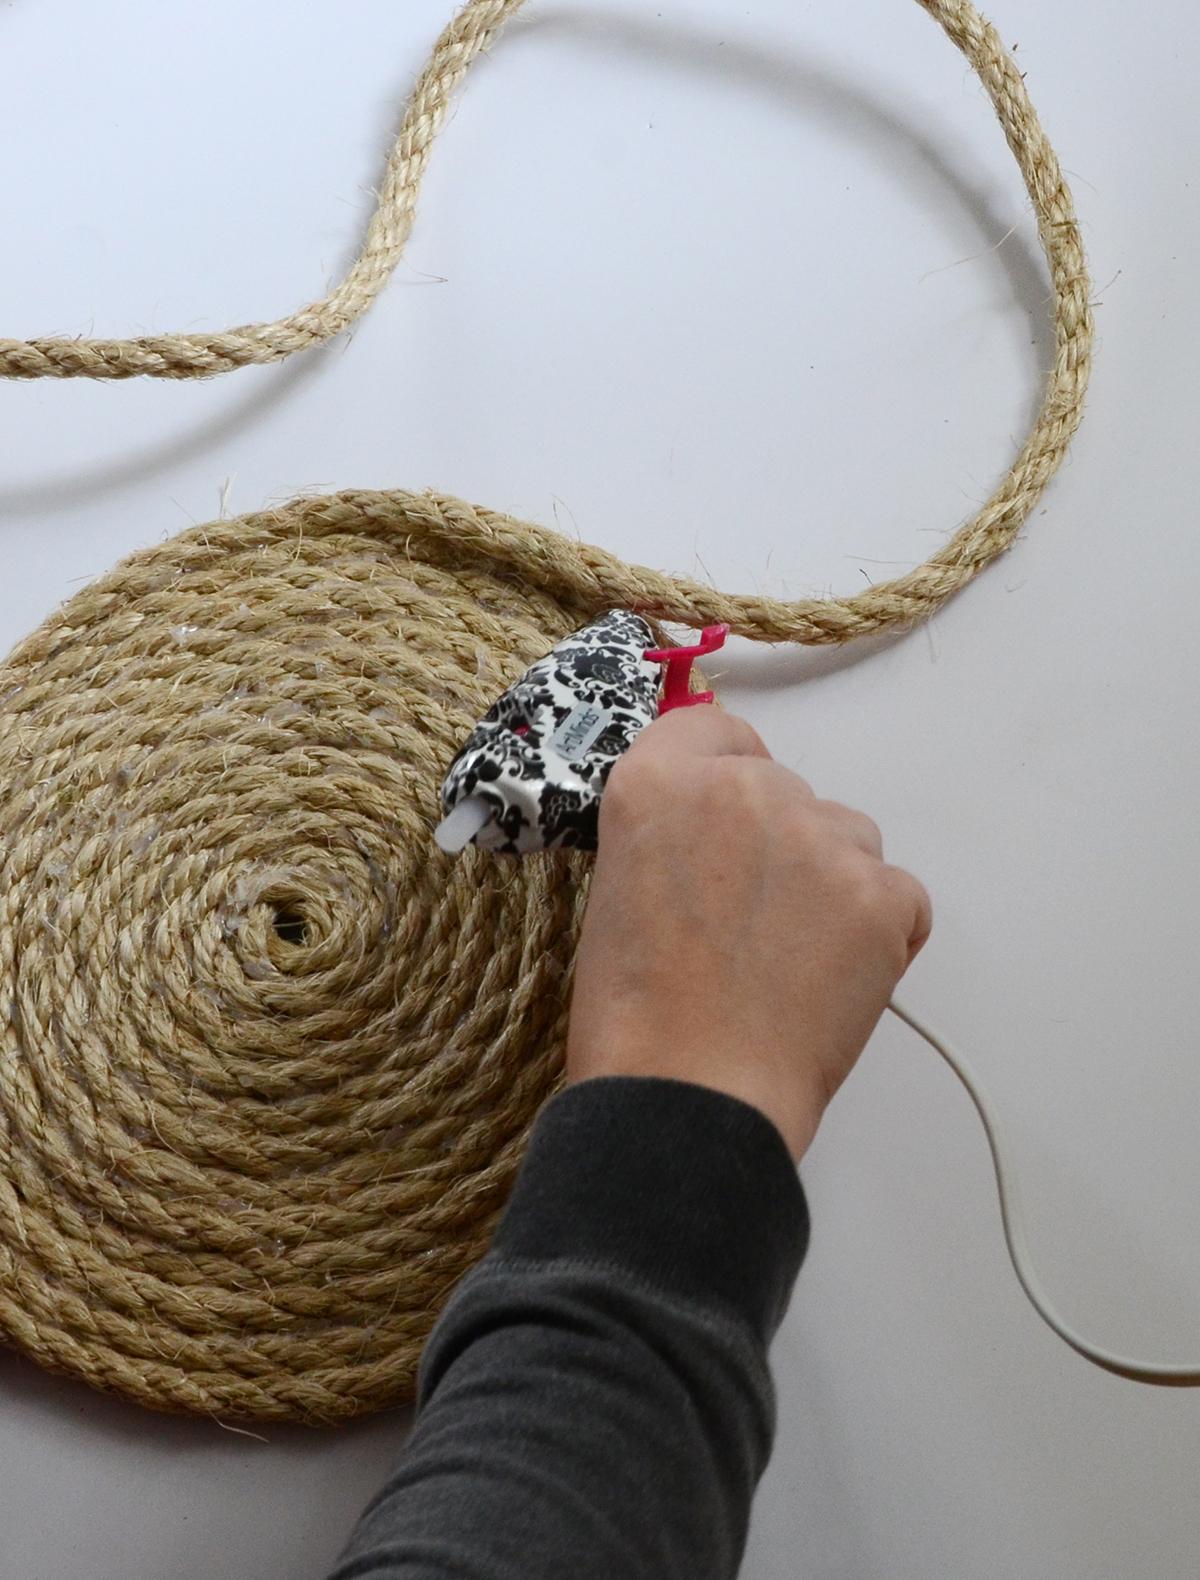 Rope Basket DIY 2